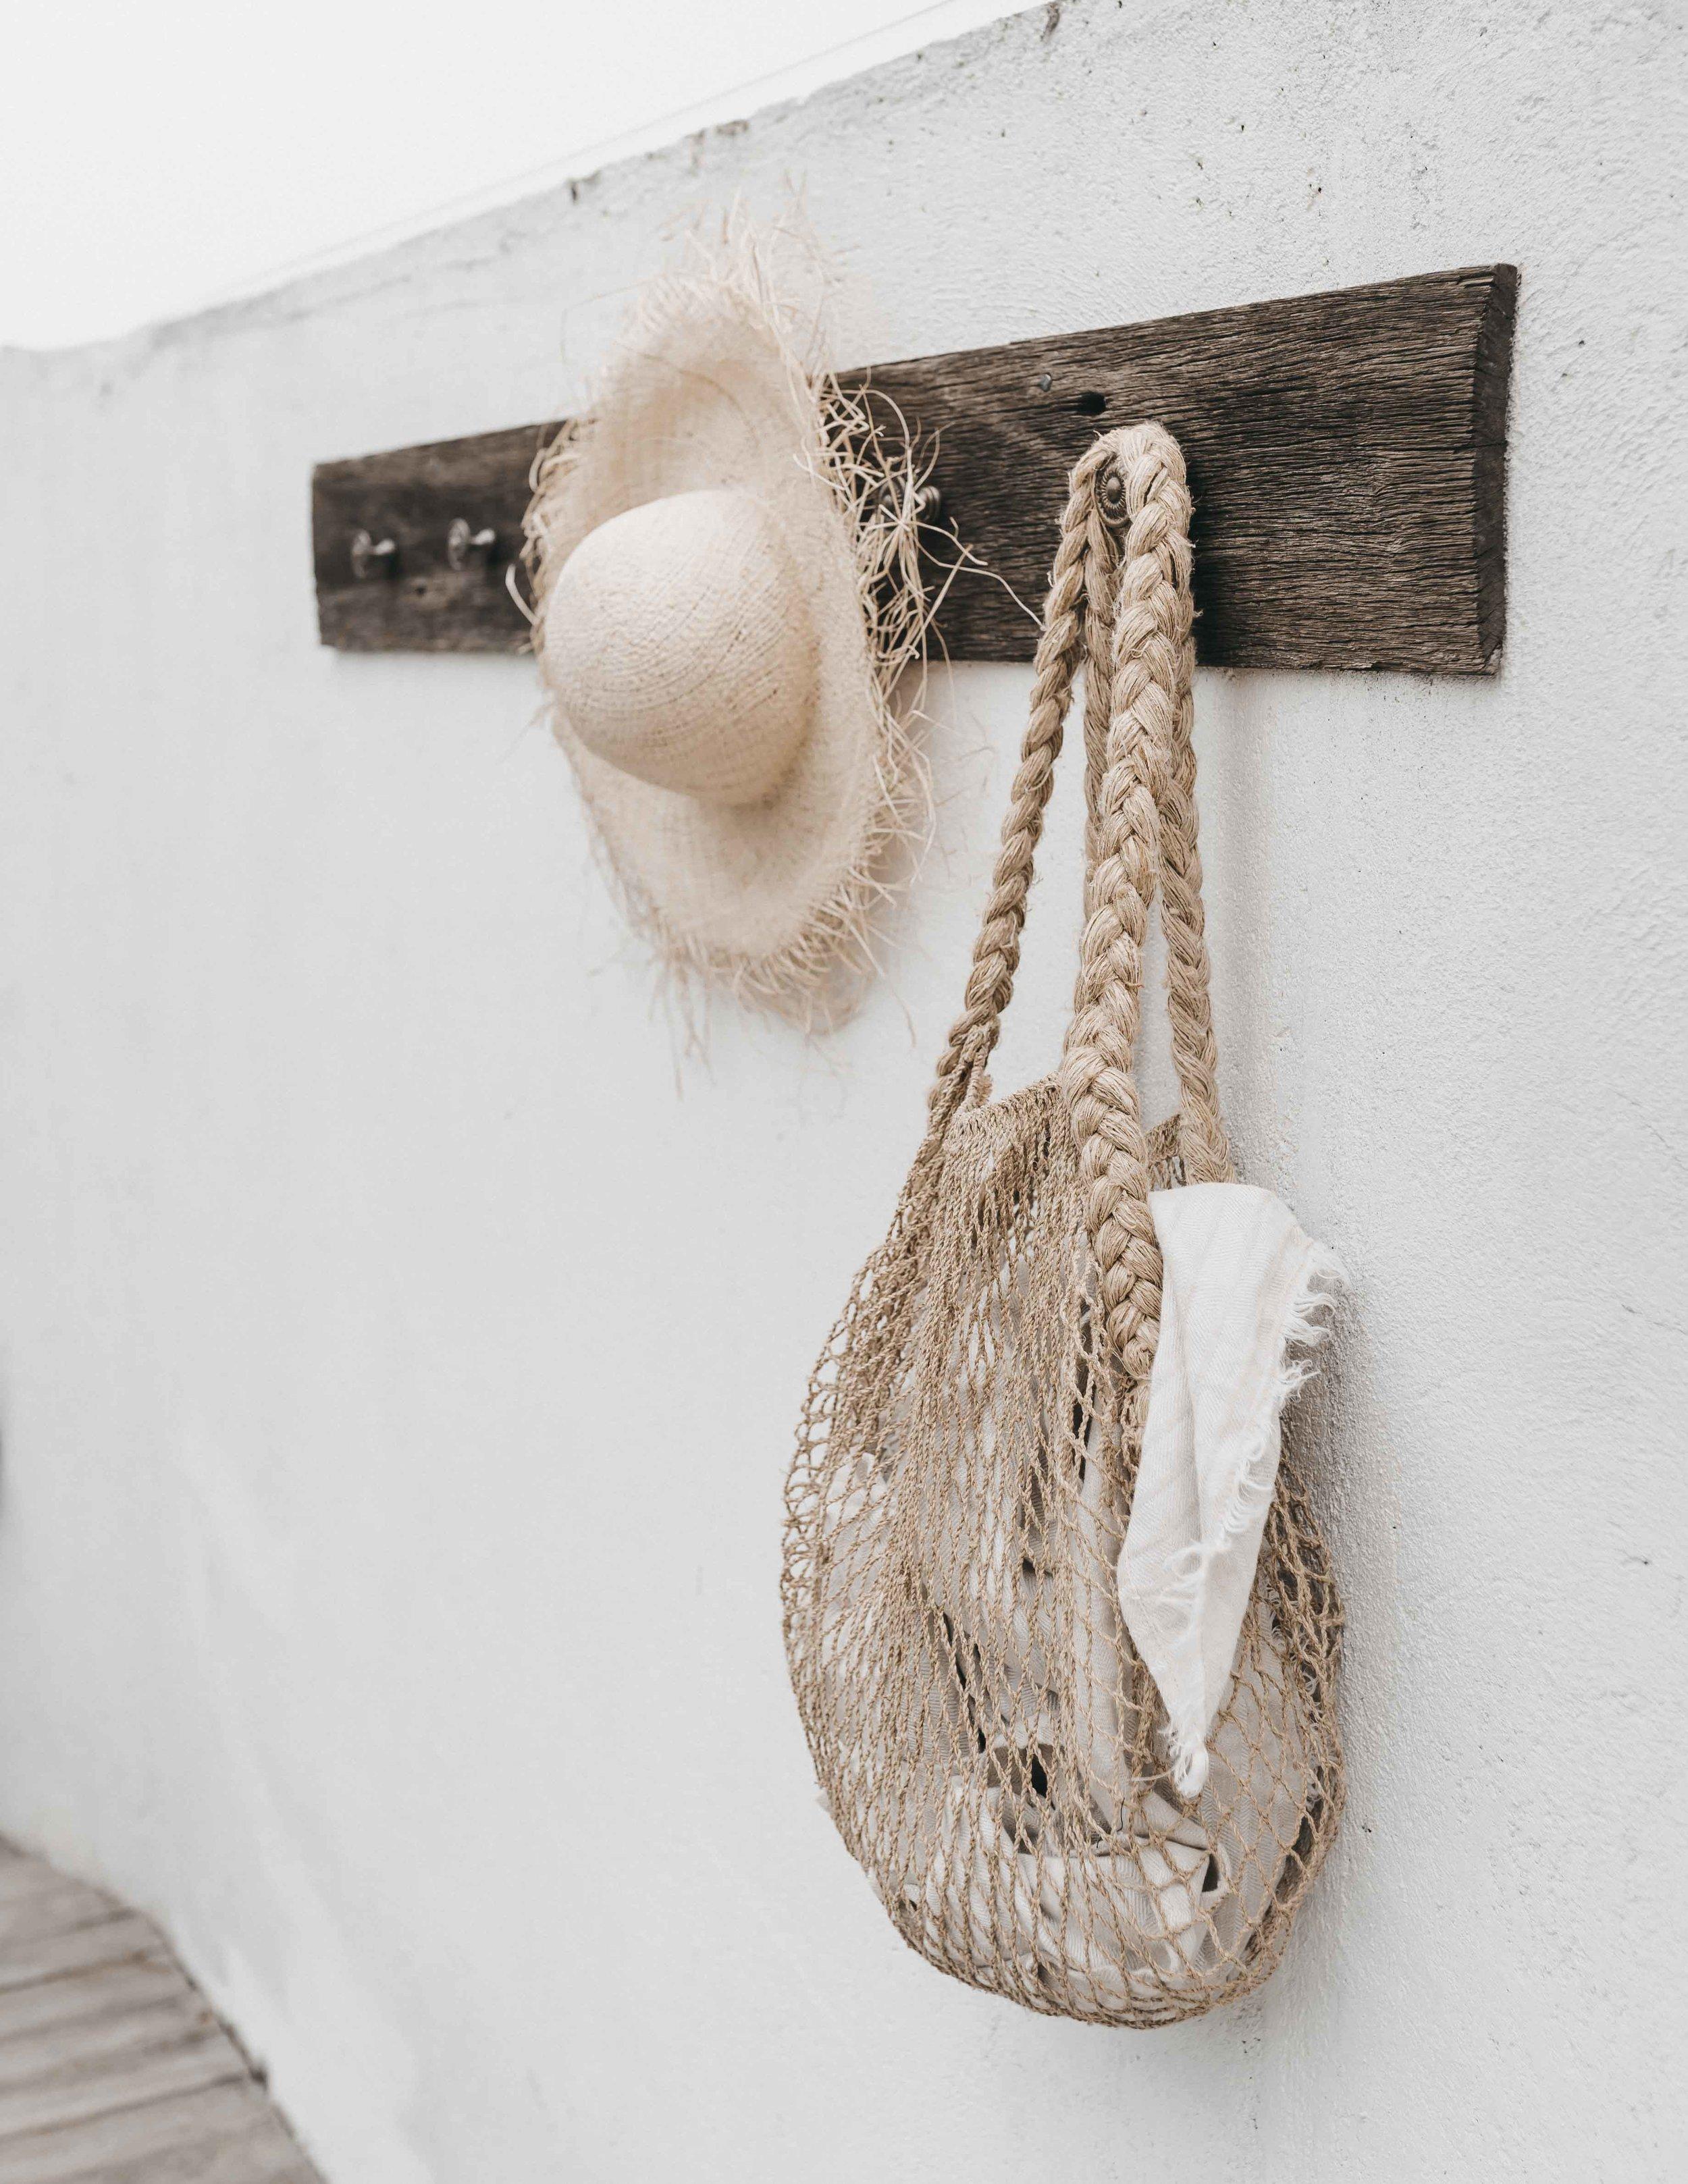 keira-mason-nowhere-and-everywhere-woven-bag-poolside.jpg